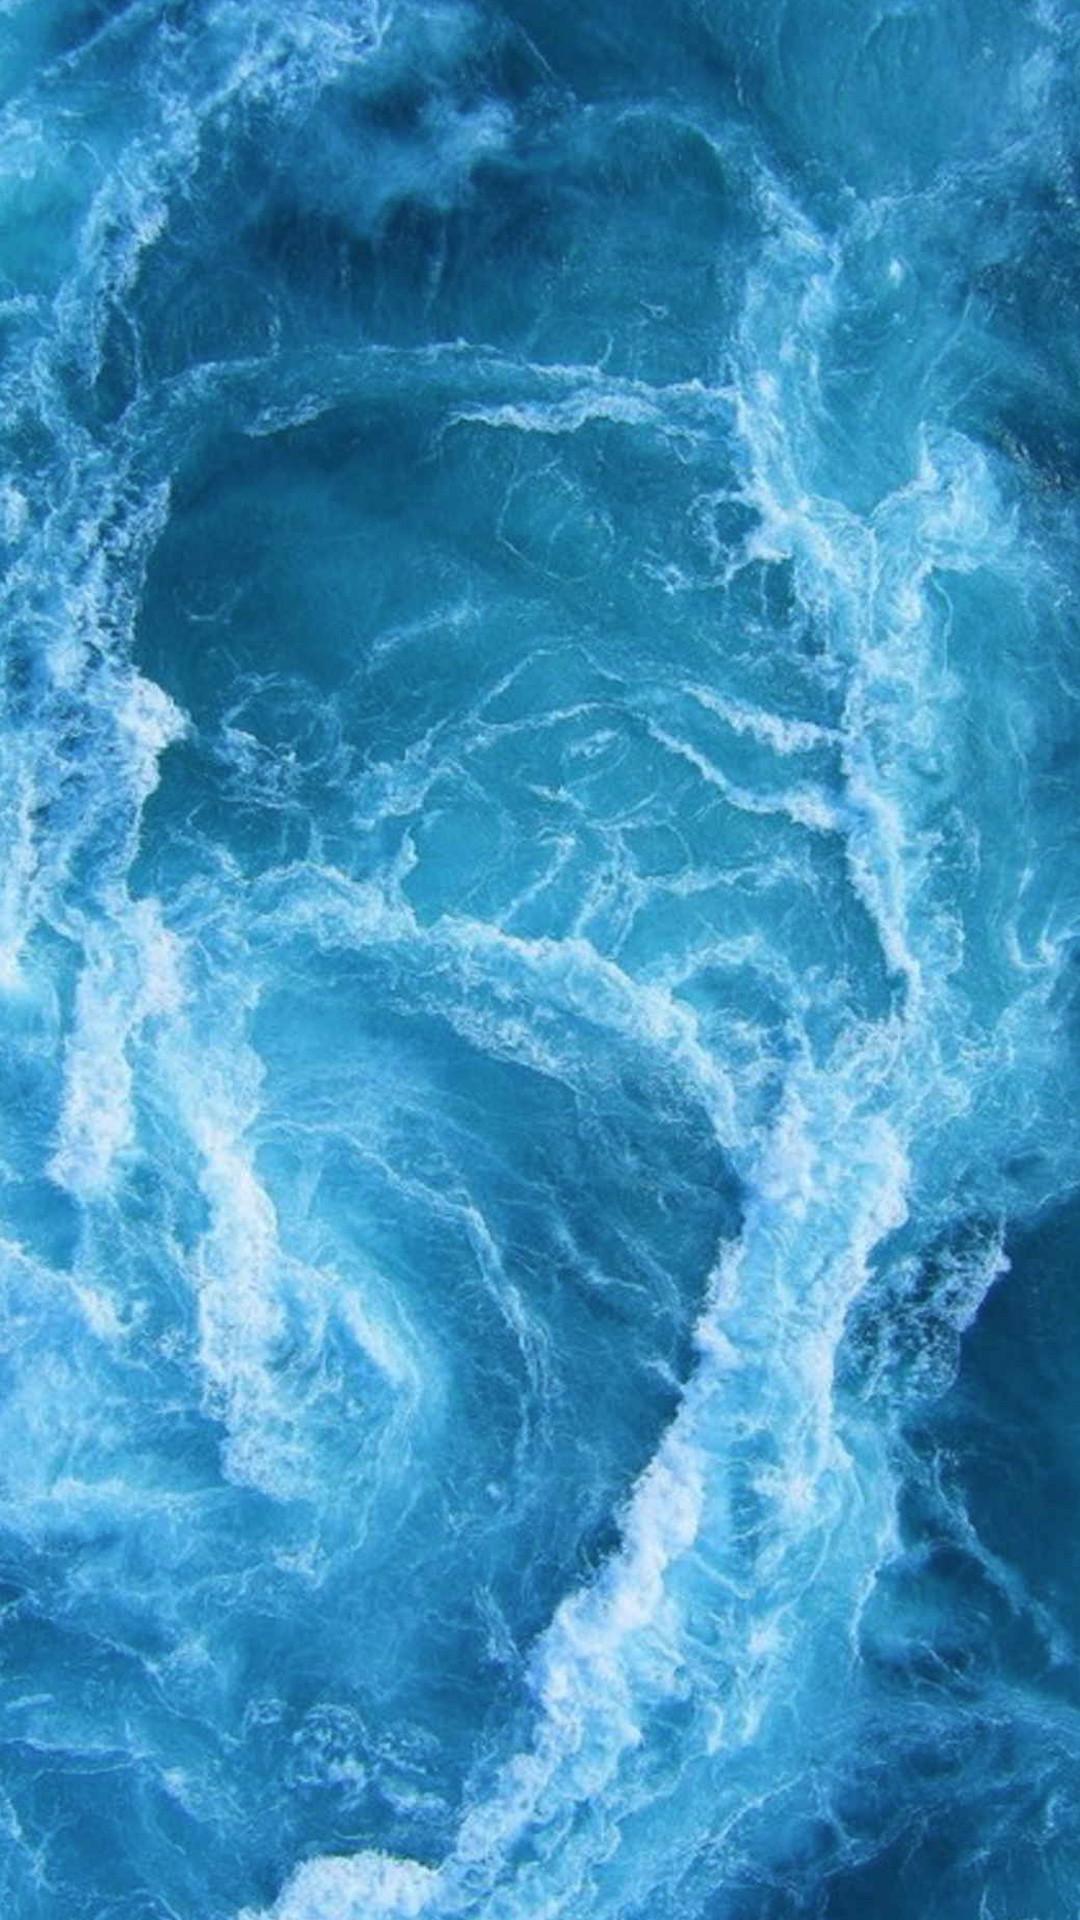 Swirling Blue Ocean Waves iPhone 6+ HD Wallpaper …